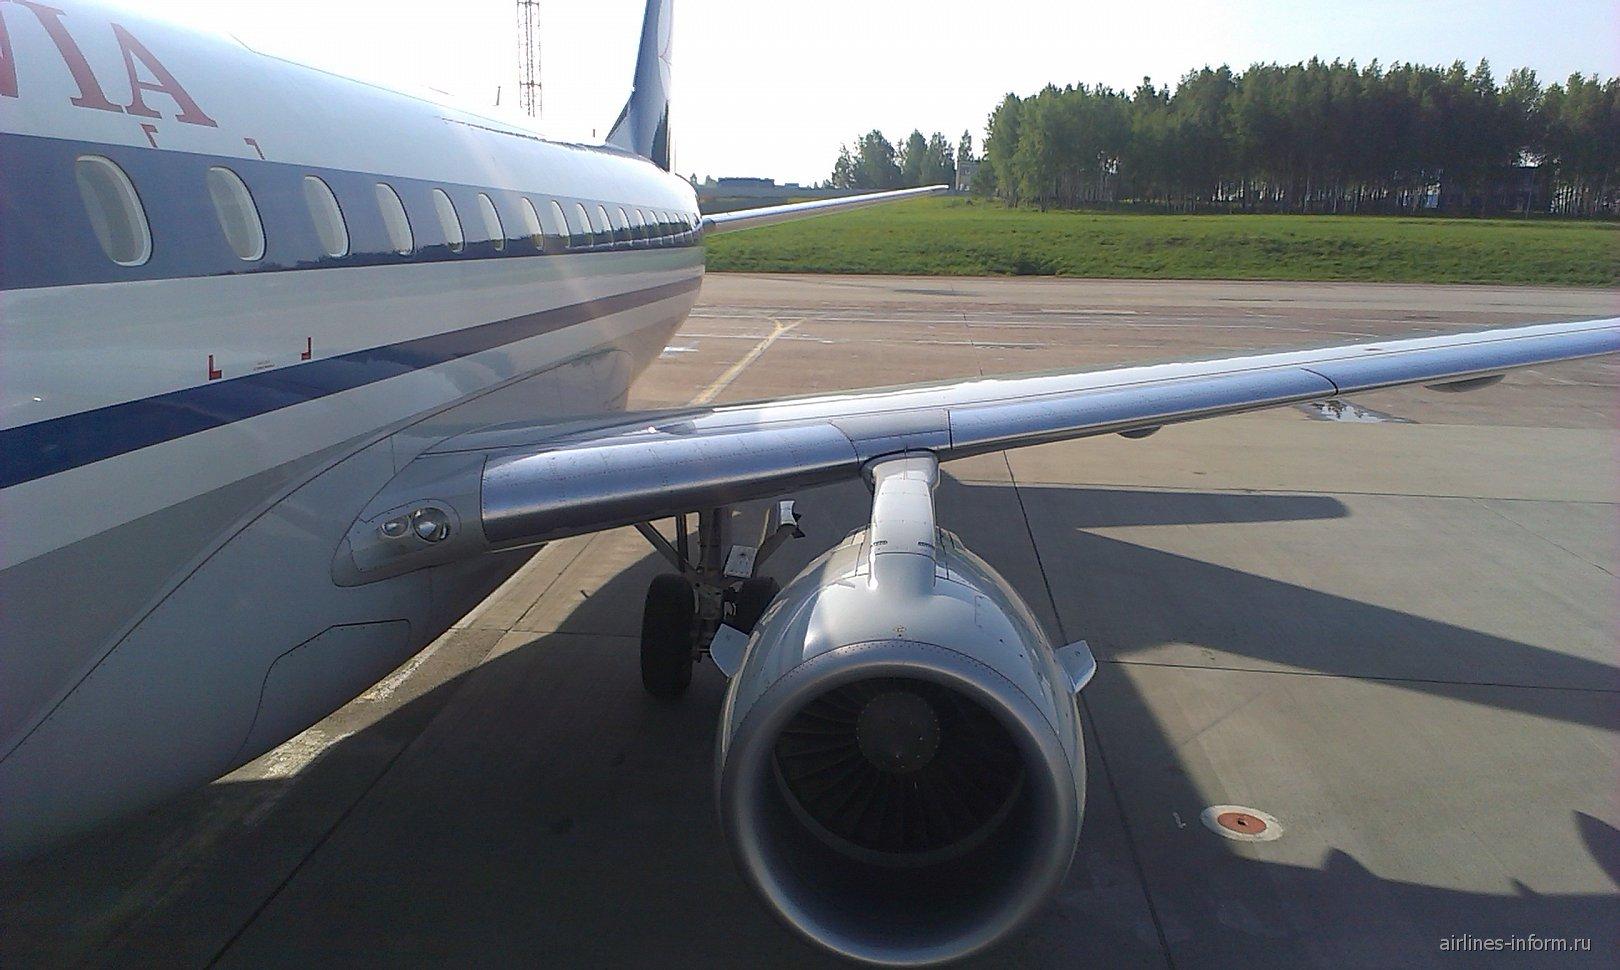 Посадка в Эмбраер-170 авиакомпании Белавиа